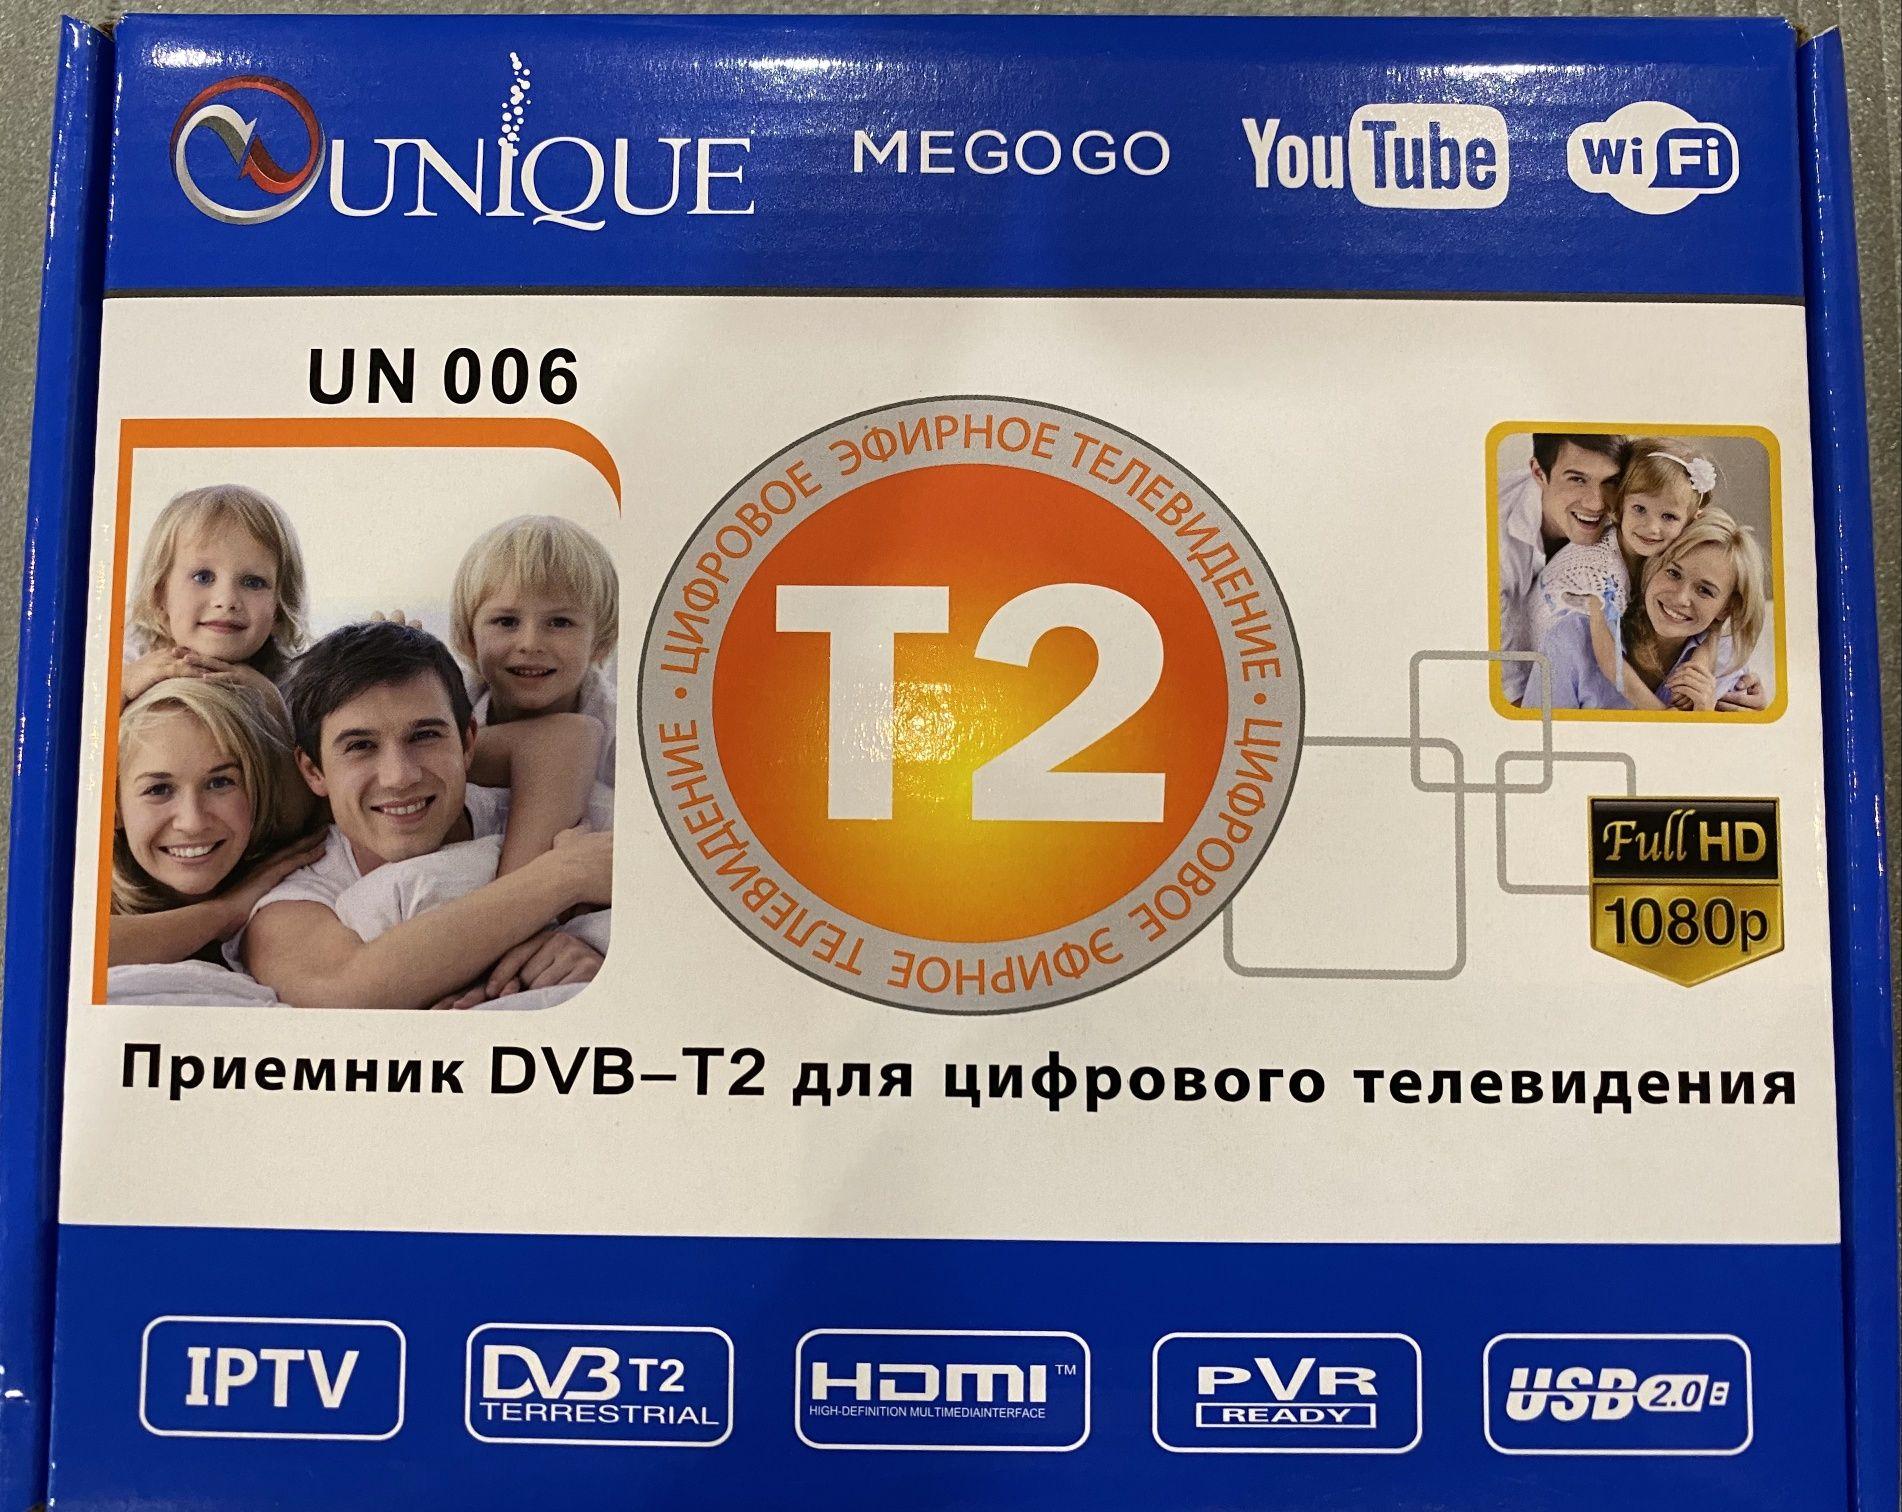 Приставка Т2,Тюнер Т2 DVB Unique в металлическом корпусе оригинал